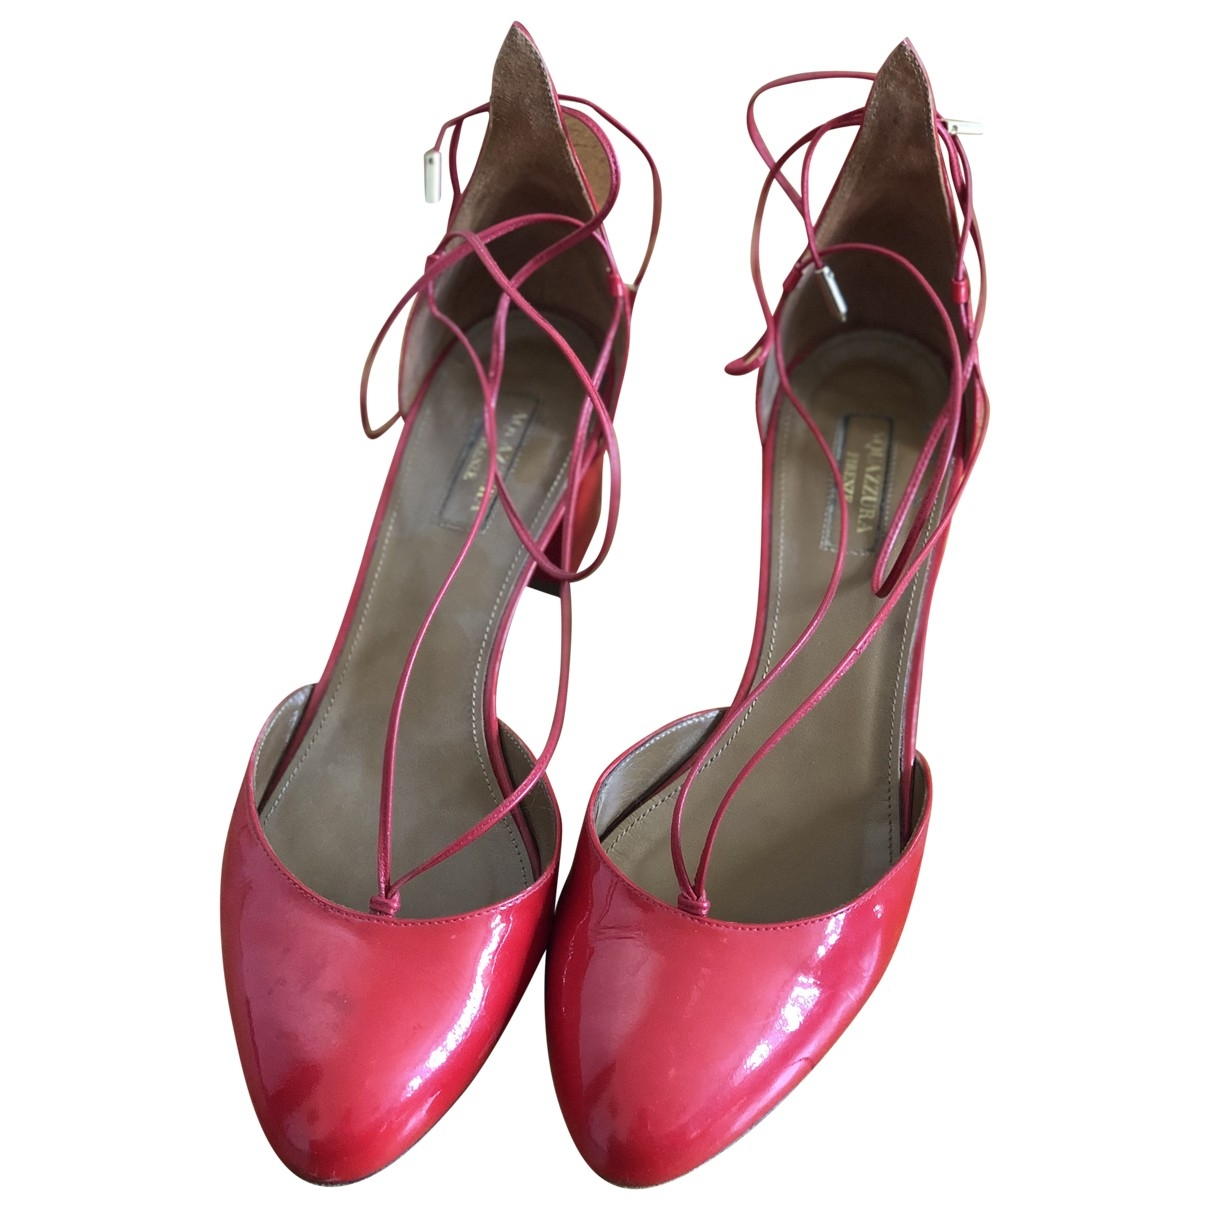 Aquazzura \N Red Patent leather Heels for Women 40 EU